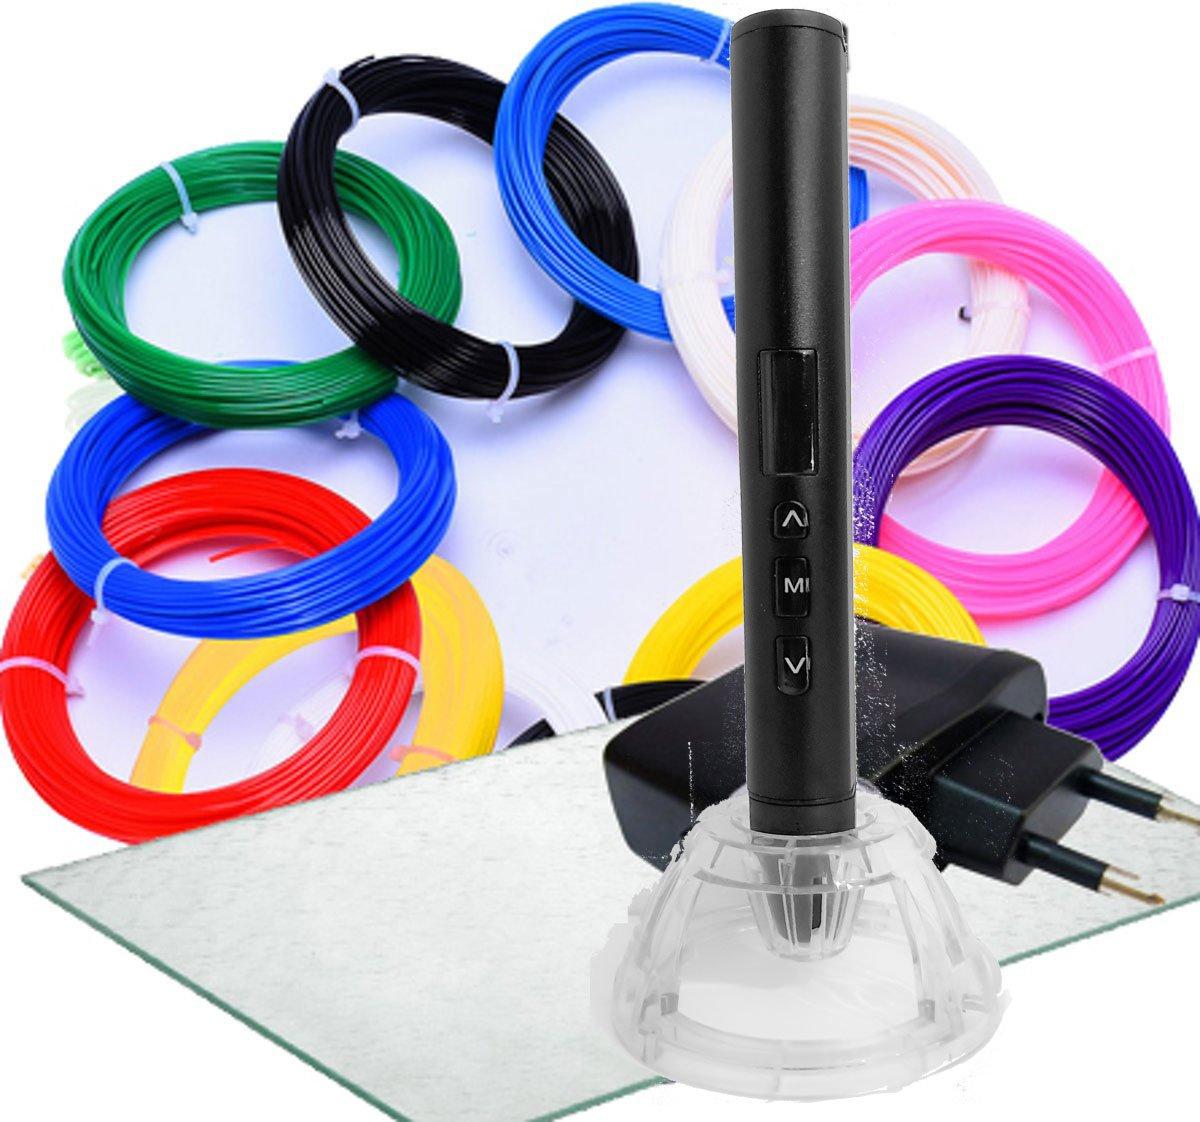 Set: 3D Pen 3DTECH Comfortline II + 12x10m + CLIPS + 3D-PAD + Adapter